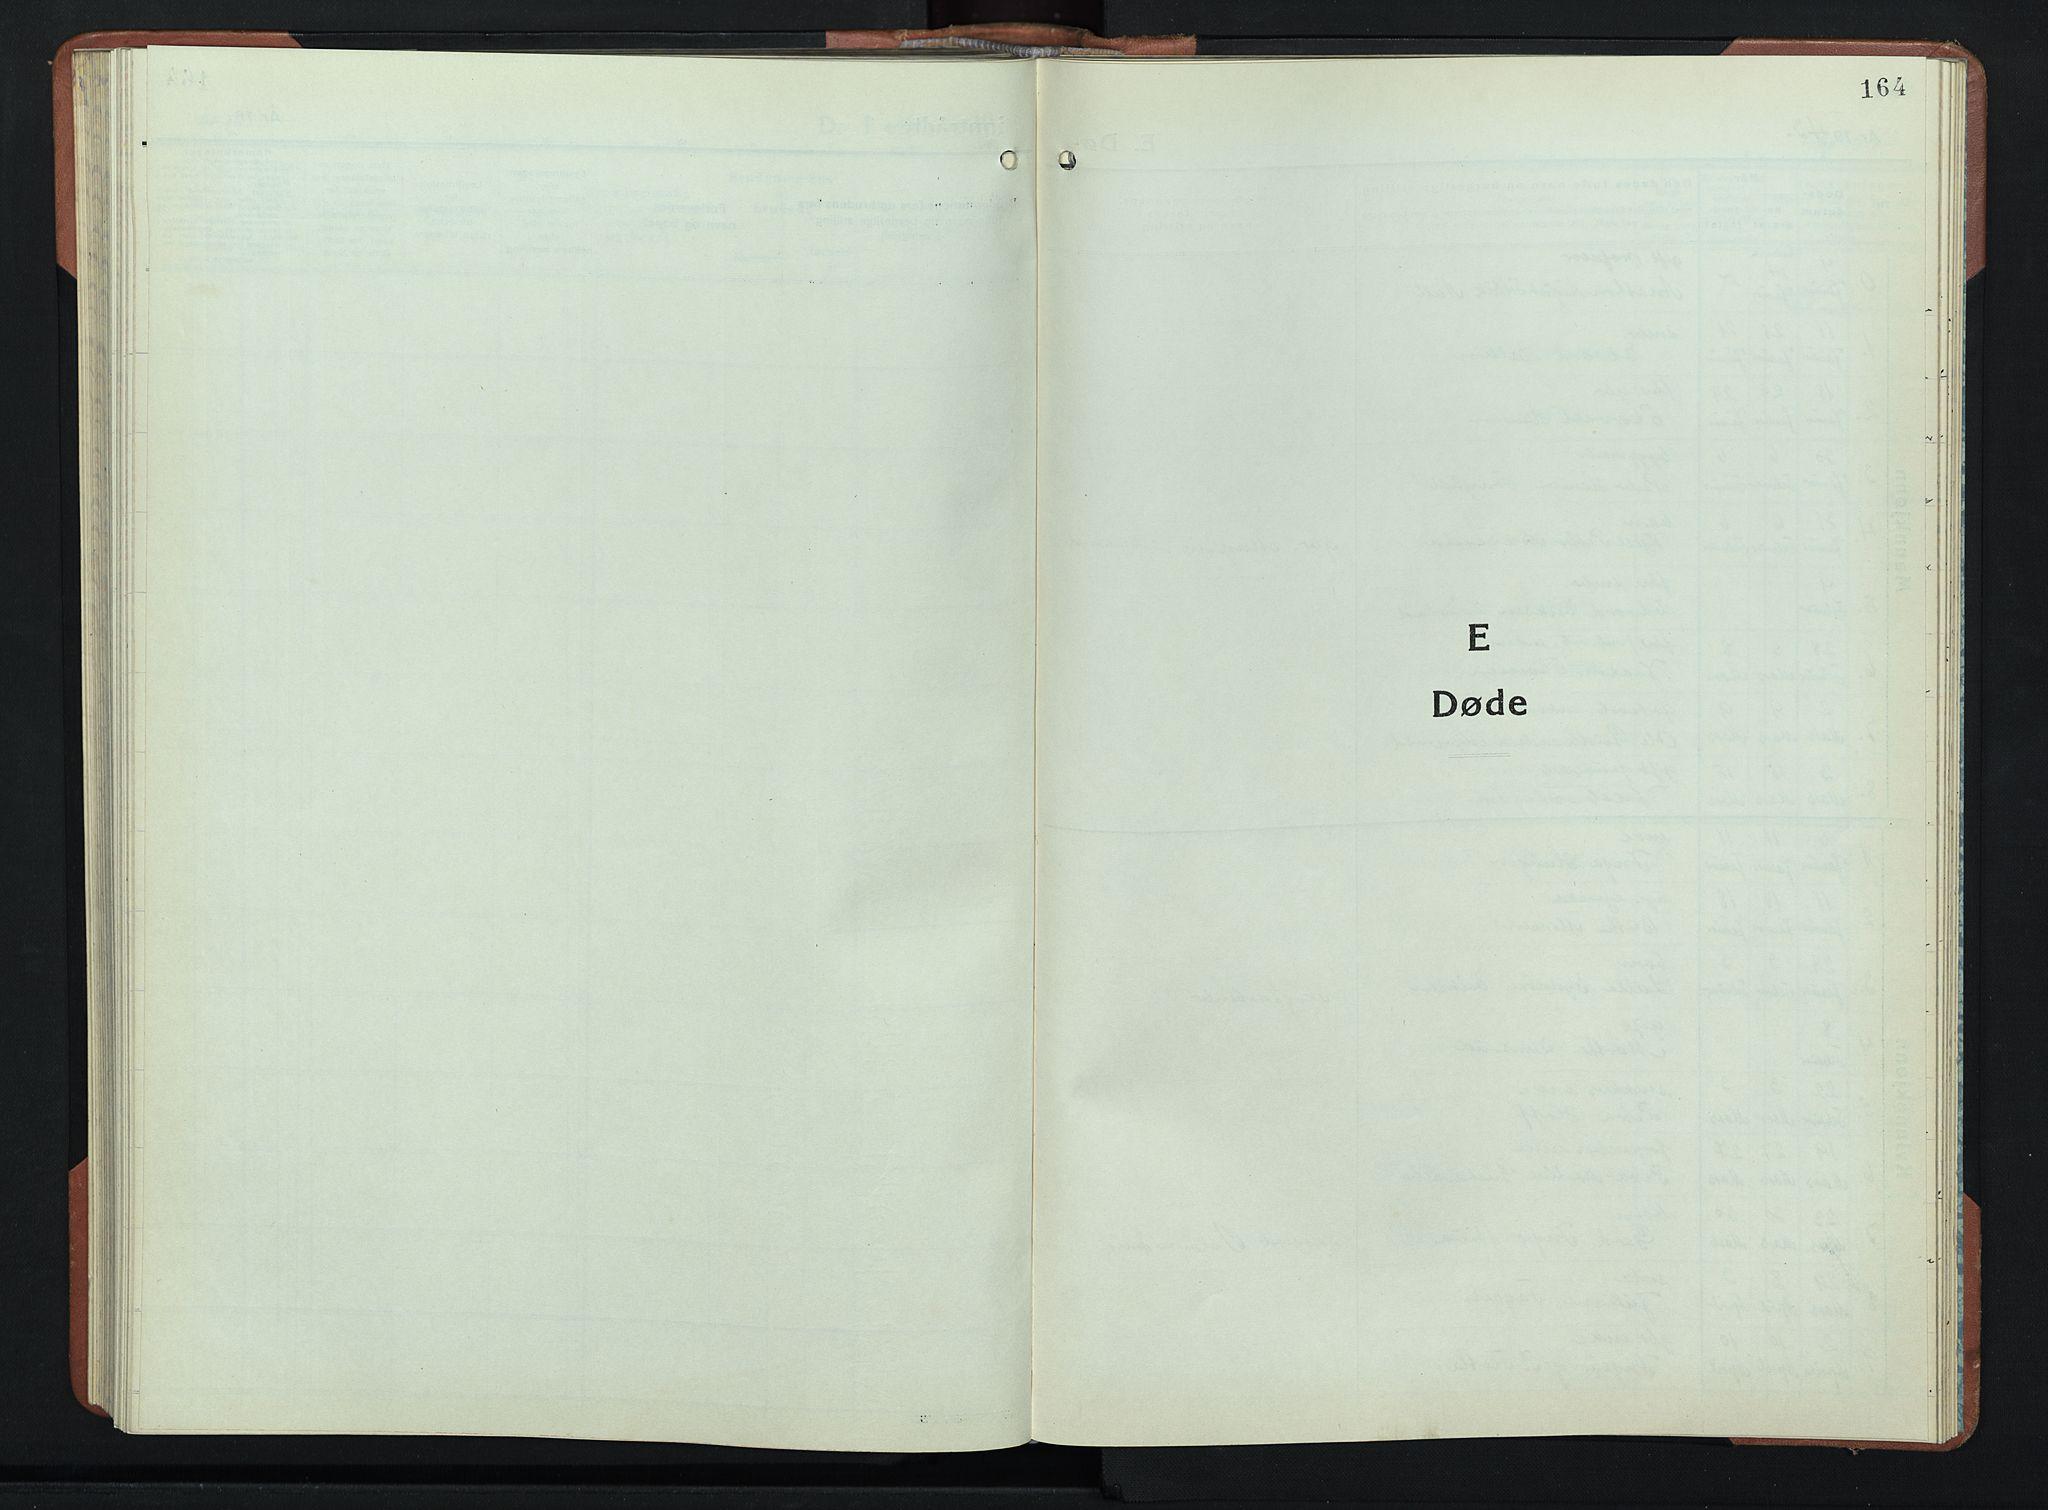 SAH, Lunner prestekontor, H/Ha/Hab/L0004: Klokkerbok nr. 4, 1943-1952, s. 164